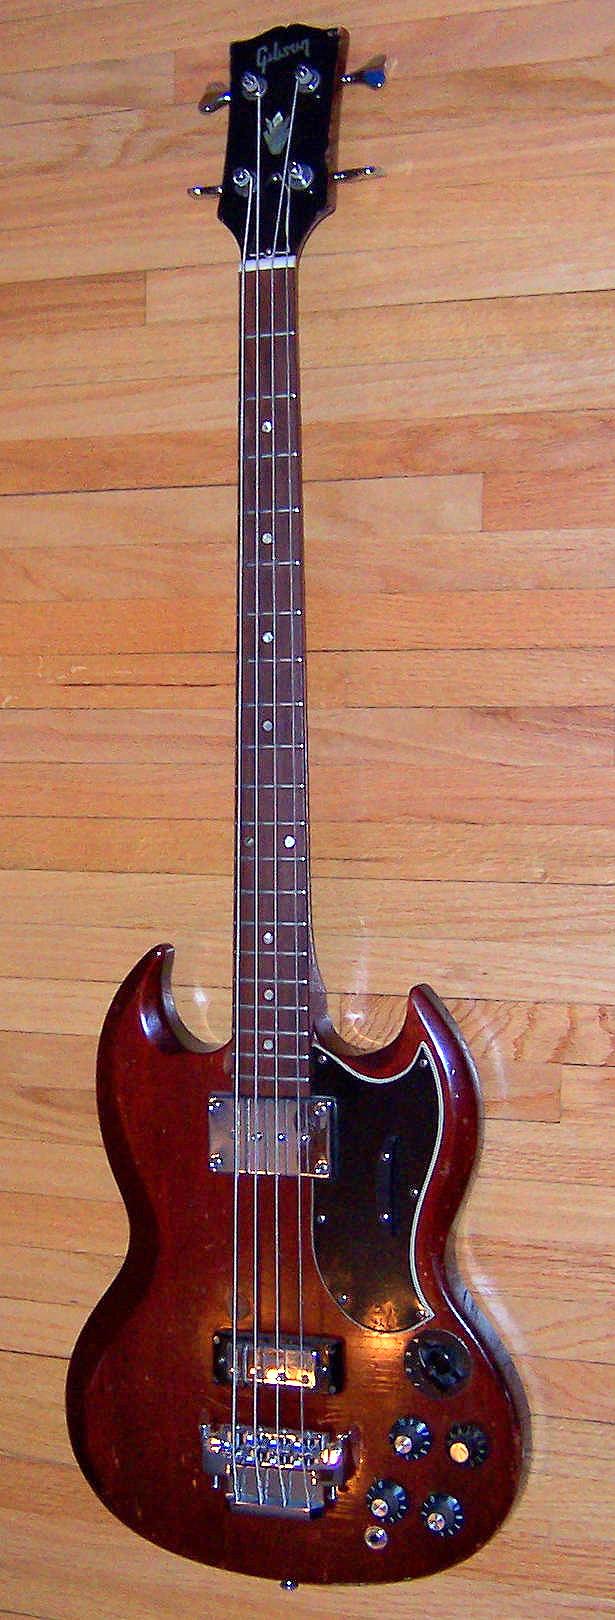 Gibson eb3 67.jpg